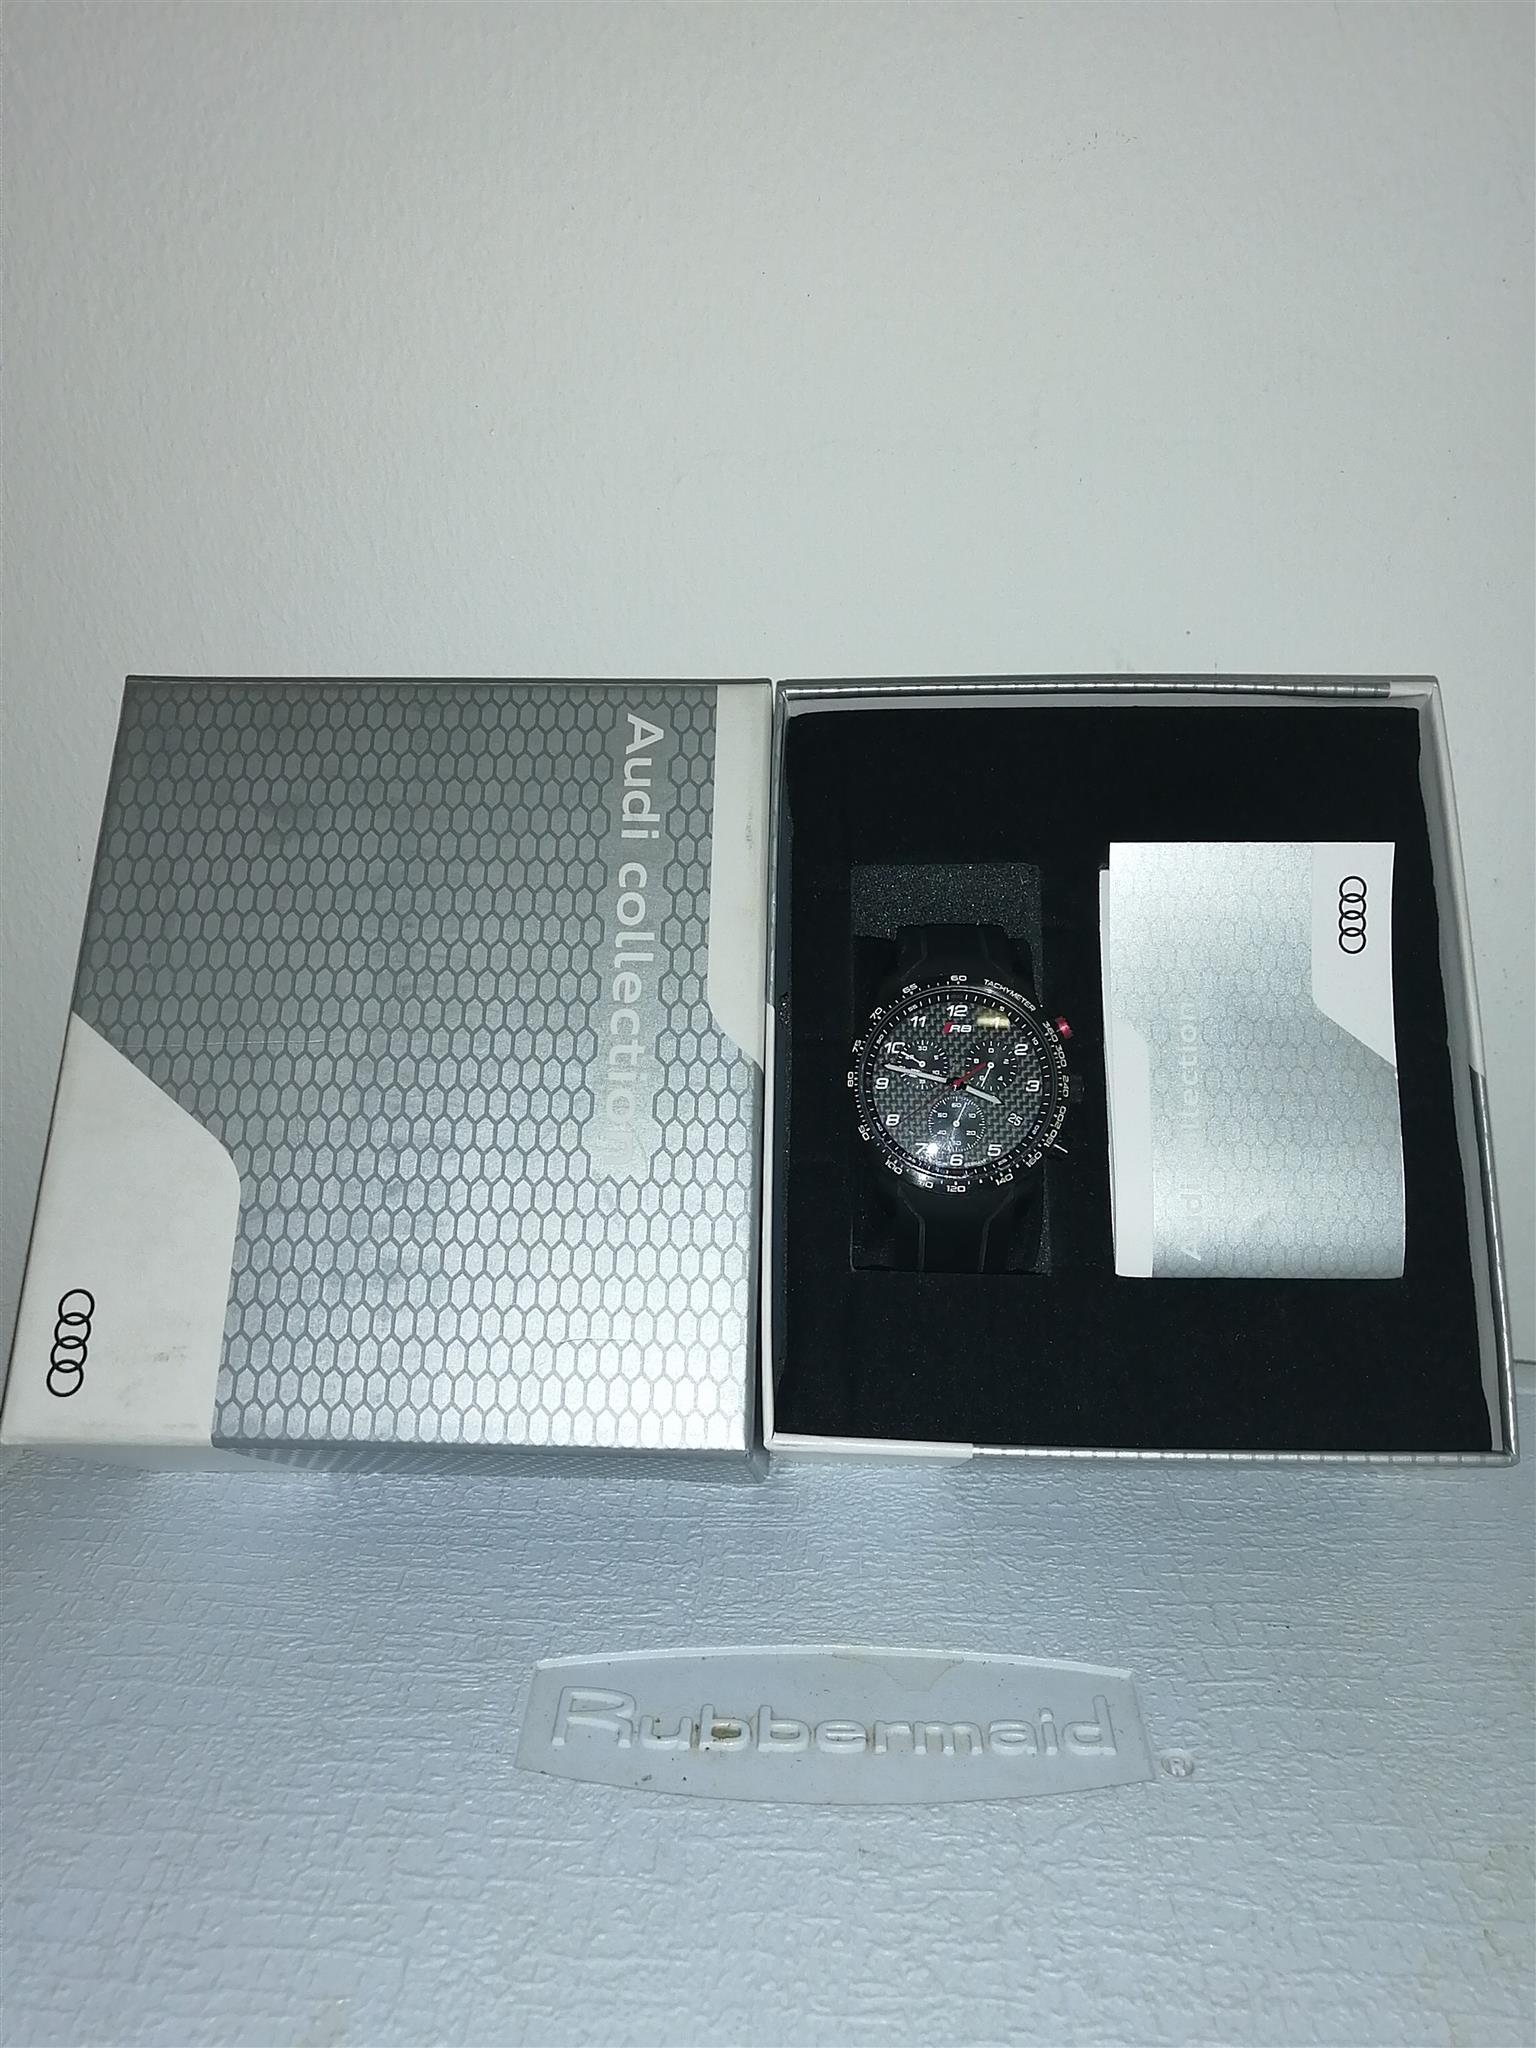 Audi R8 watch for sale original